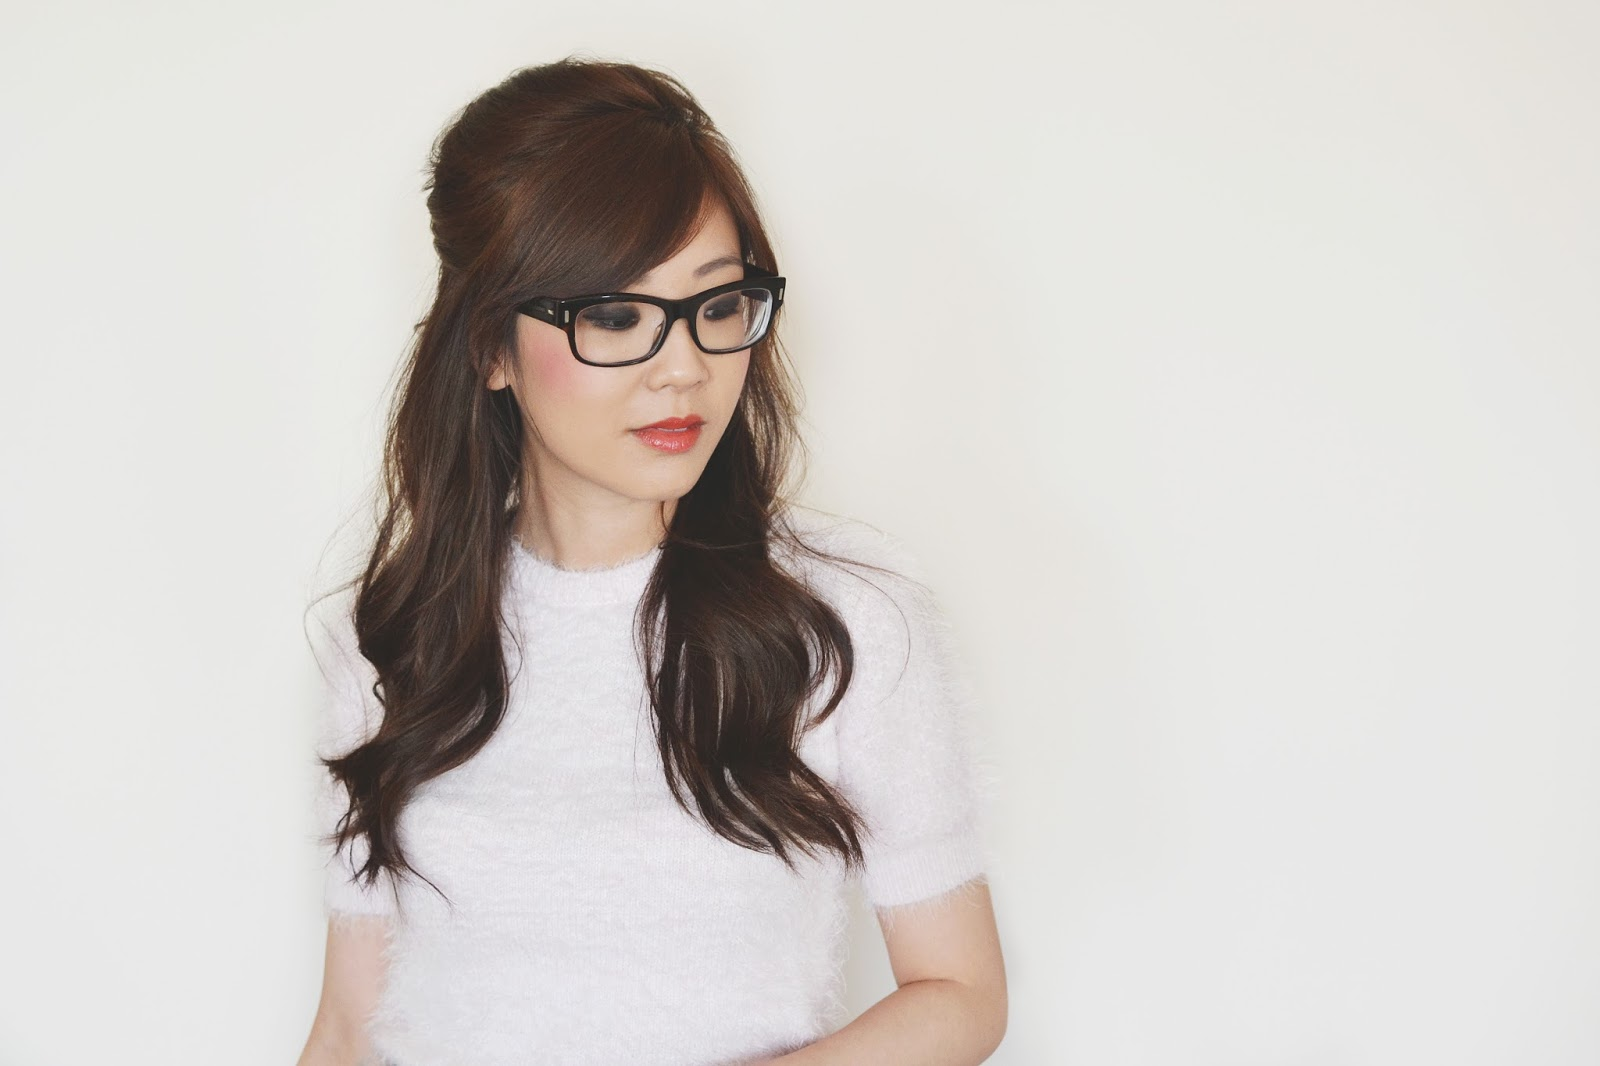 hair style for brunettes, hair style for medium length hair